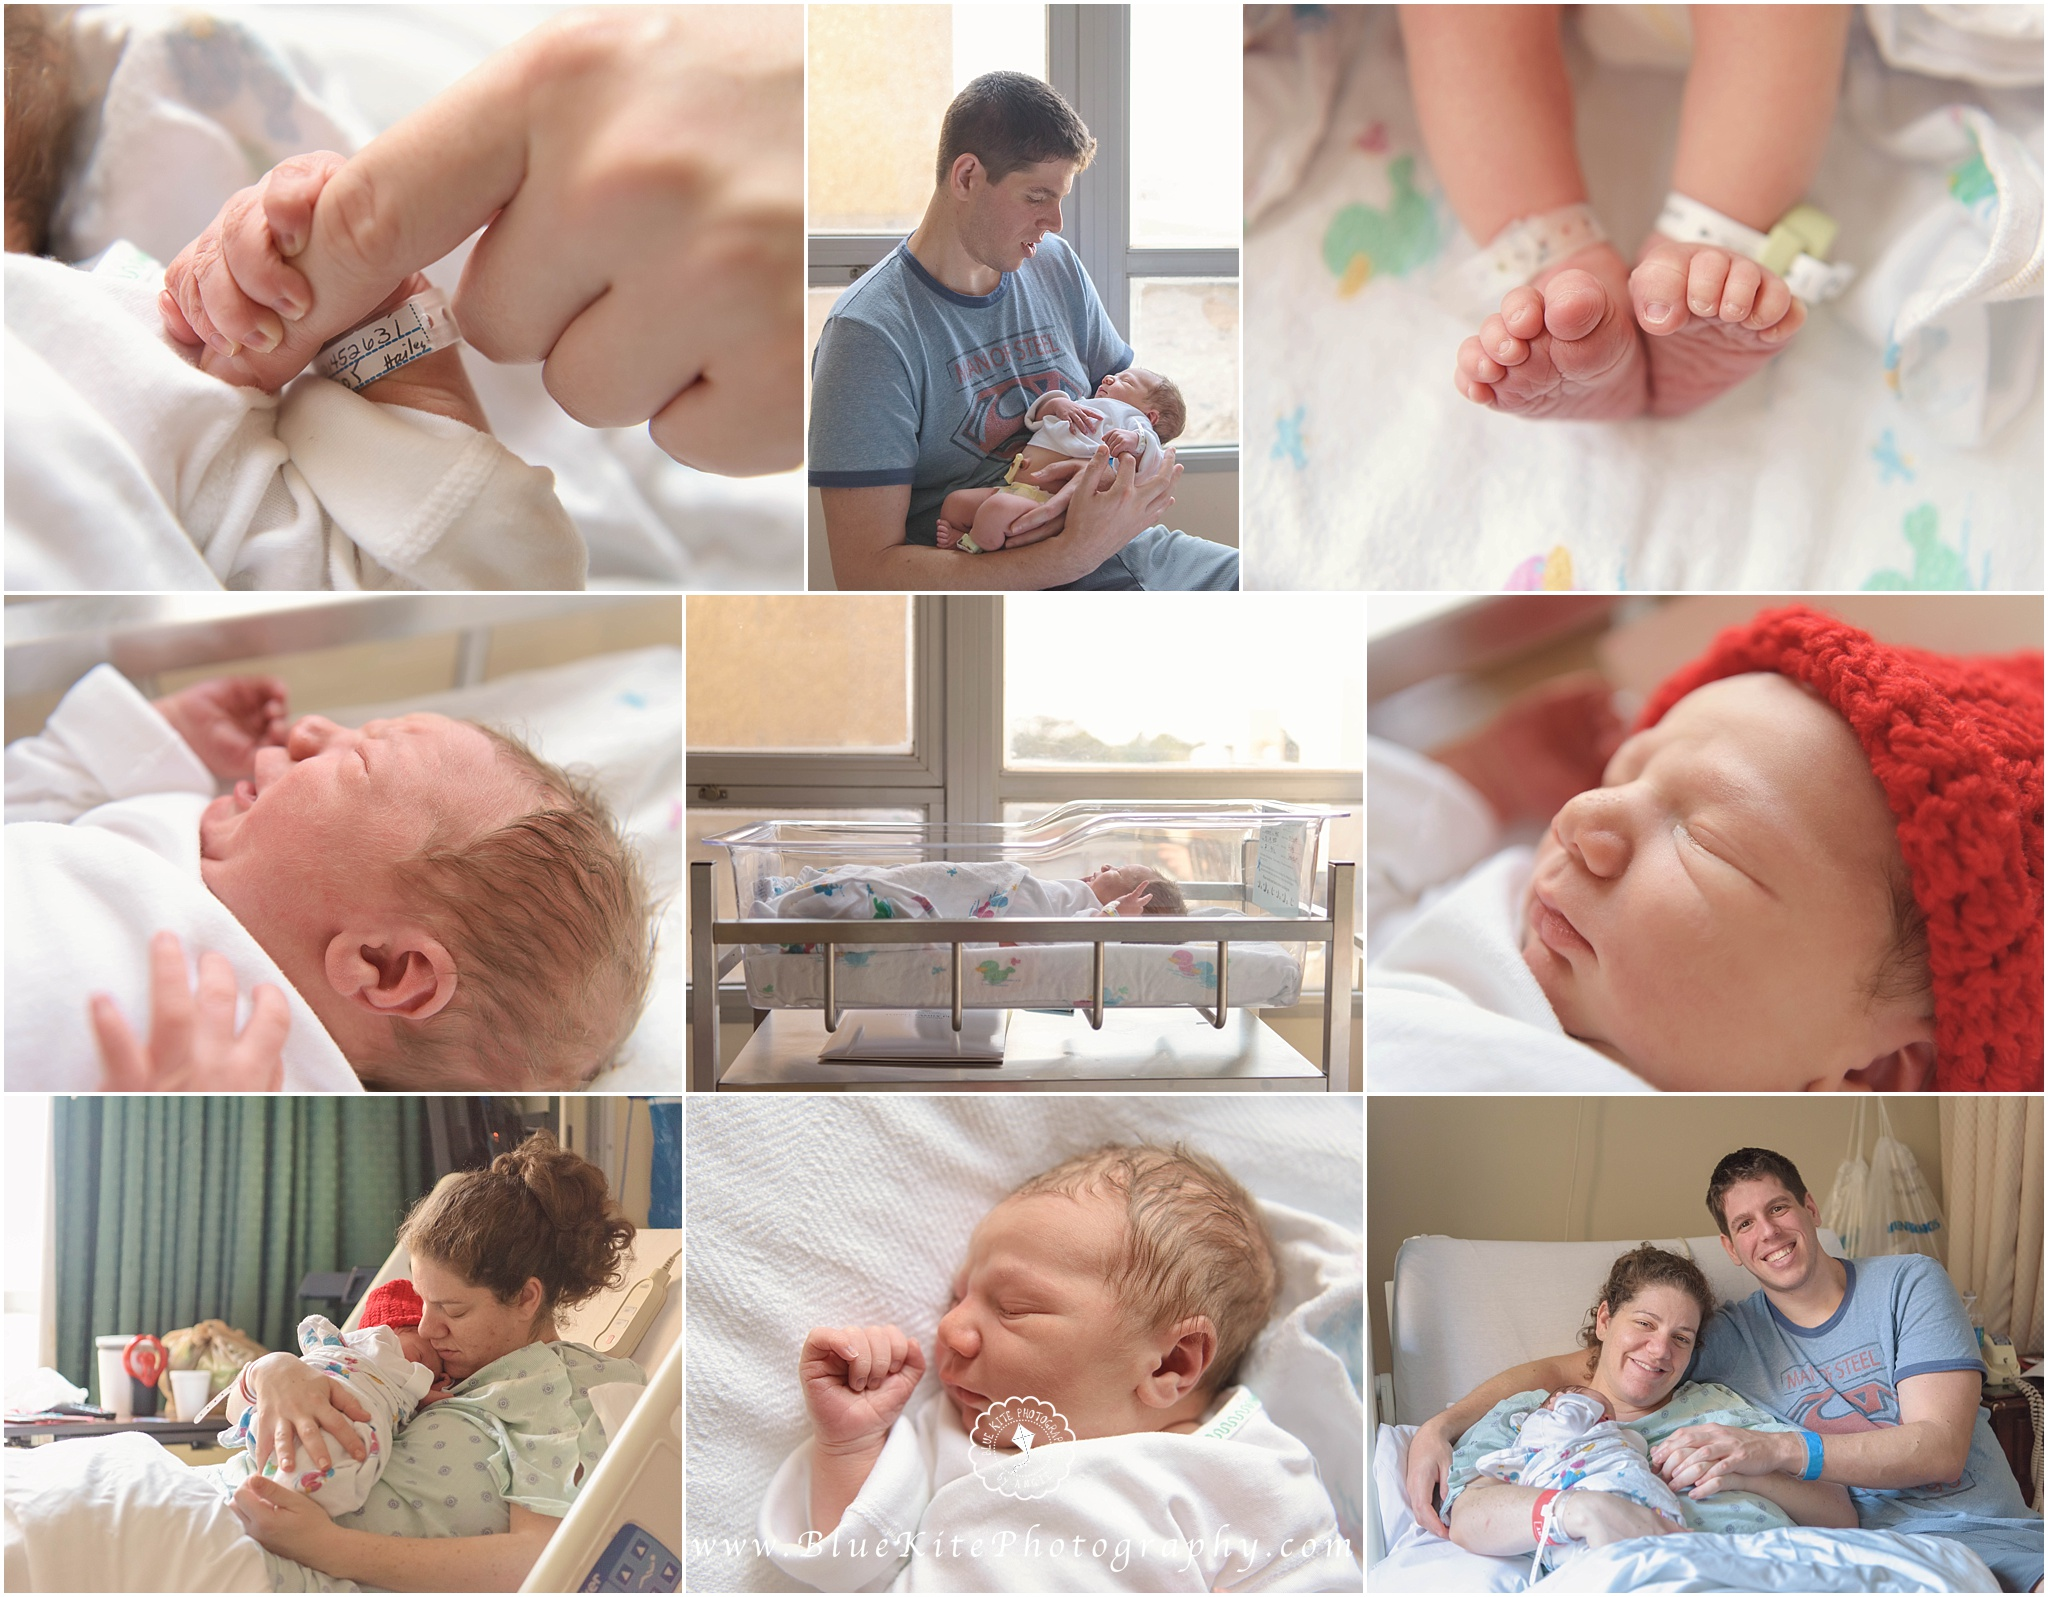 fresh 48 newborn session, fresh 48 video session, newborn session, Boca Raton Regional Hospital, Boca Raton, Coral Springs, Parkland, South Florida, Boynton Beach, Delray Beach